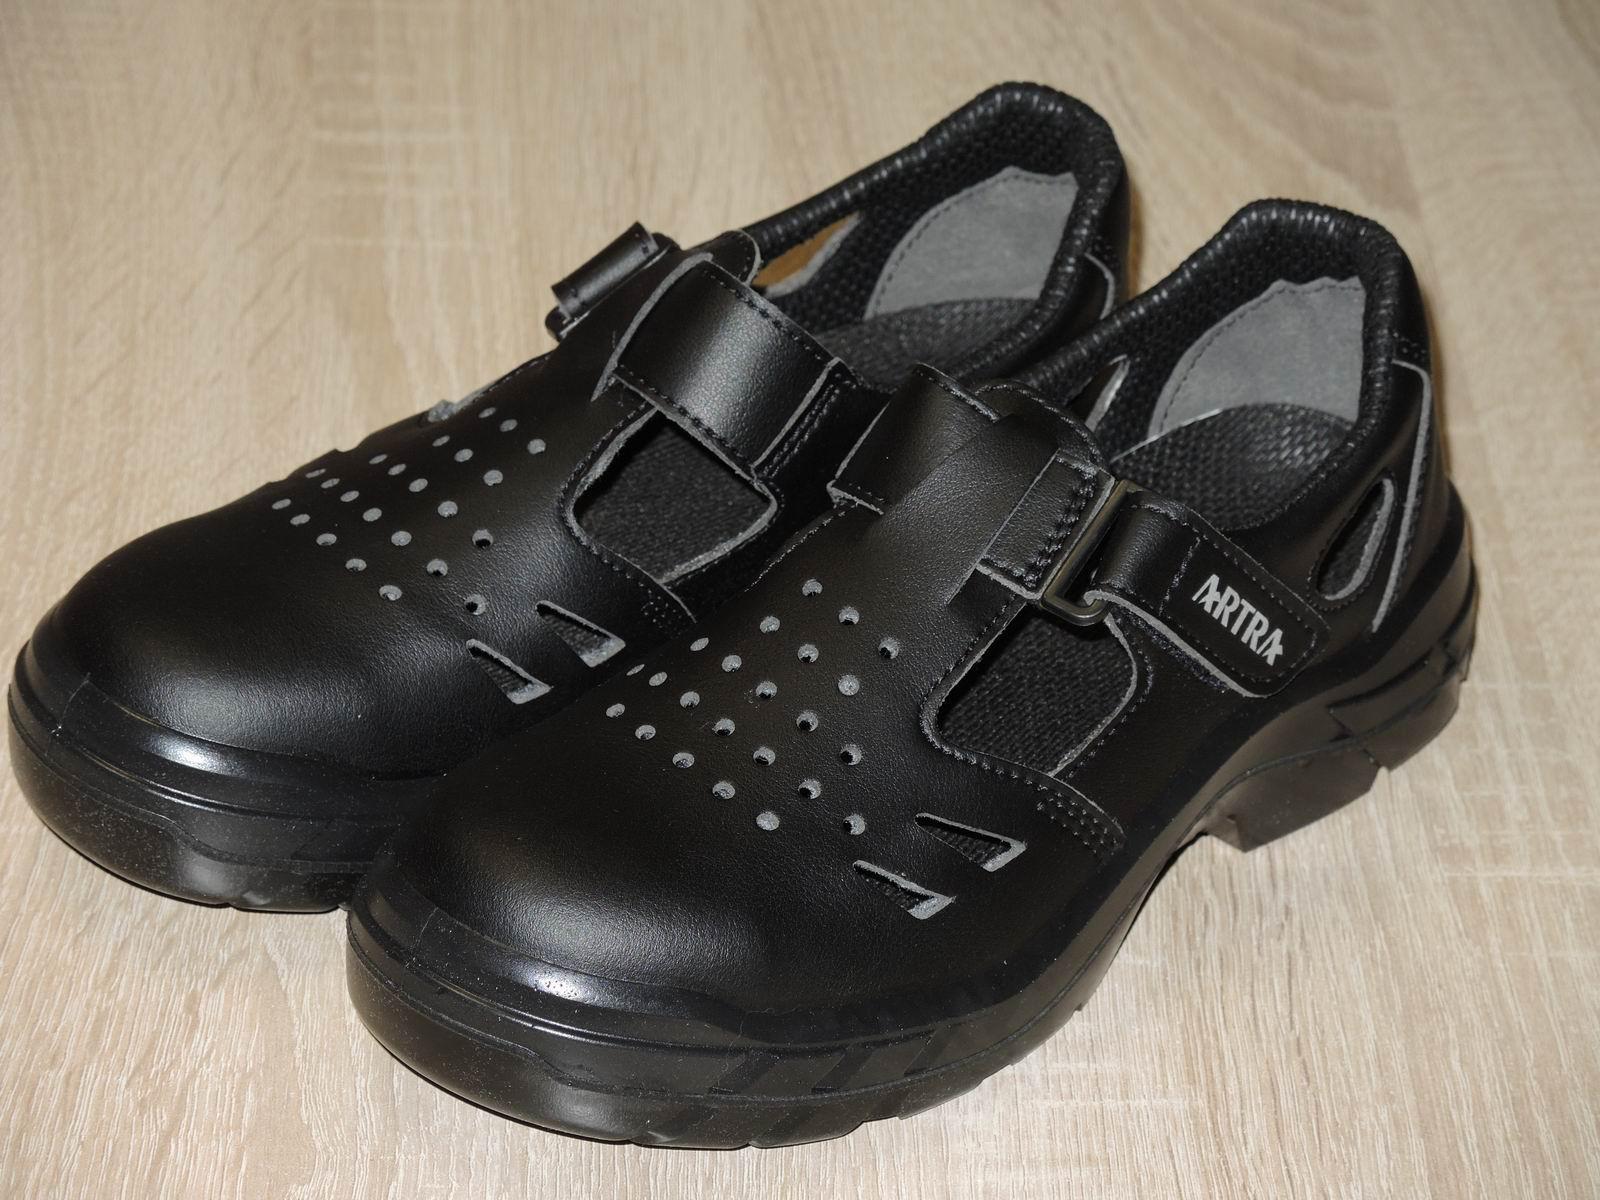 Pracovné topánky č.40 - Obrázok č. 1